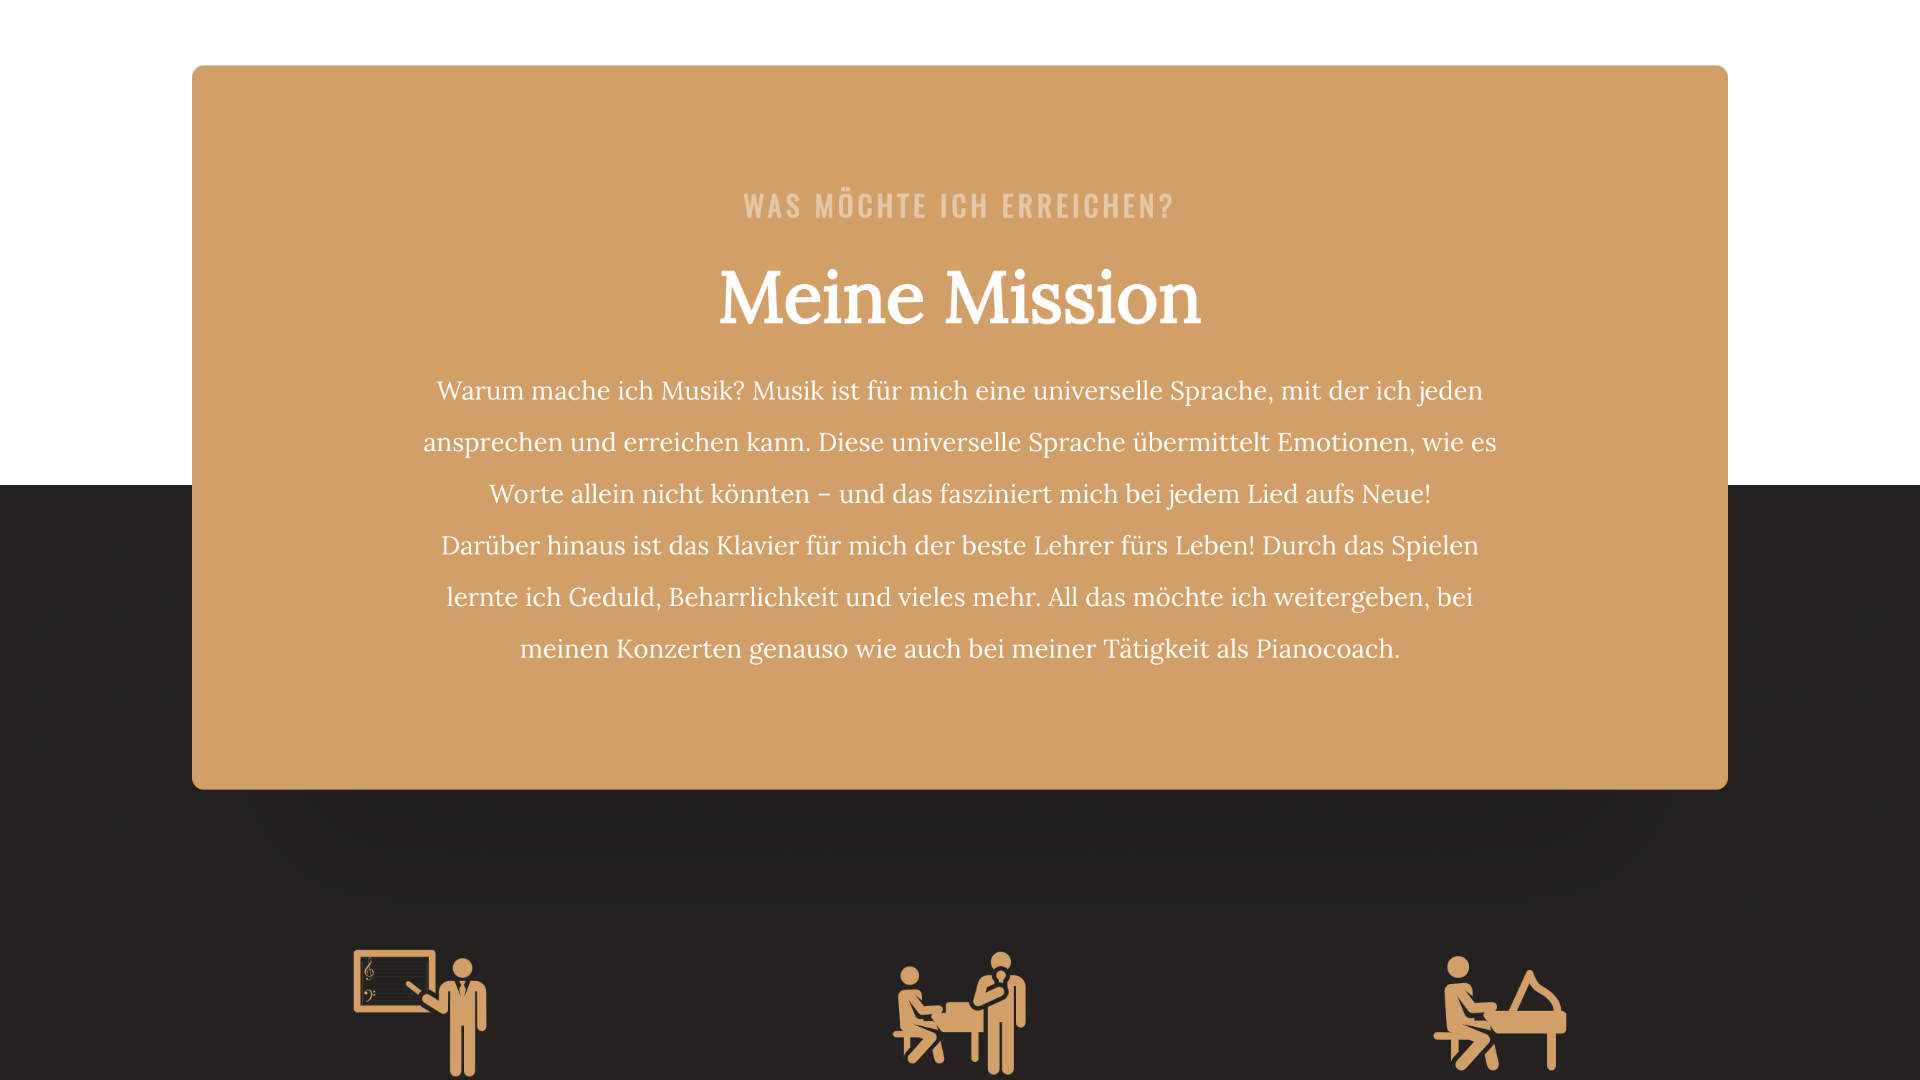 berndspeier - Meine Mission